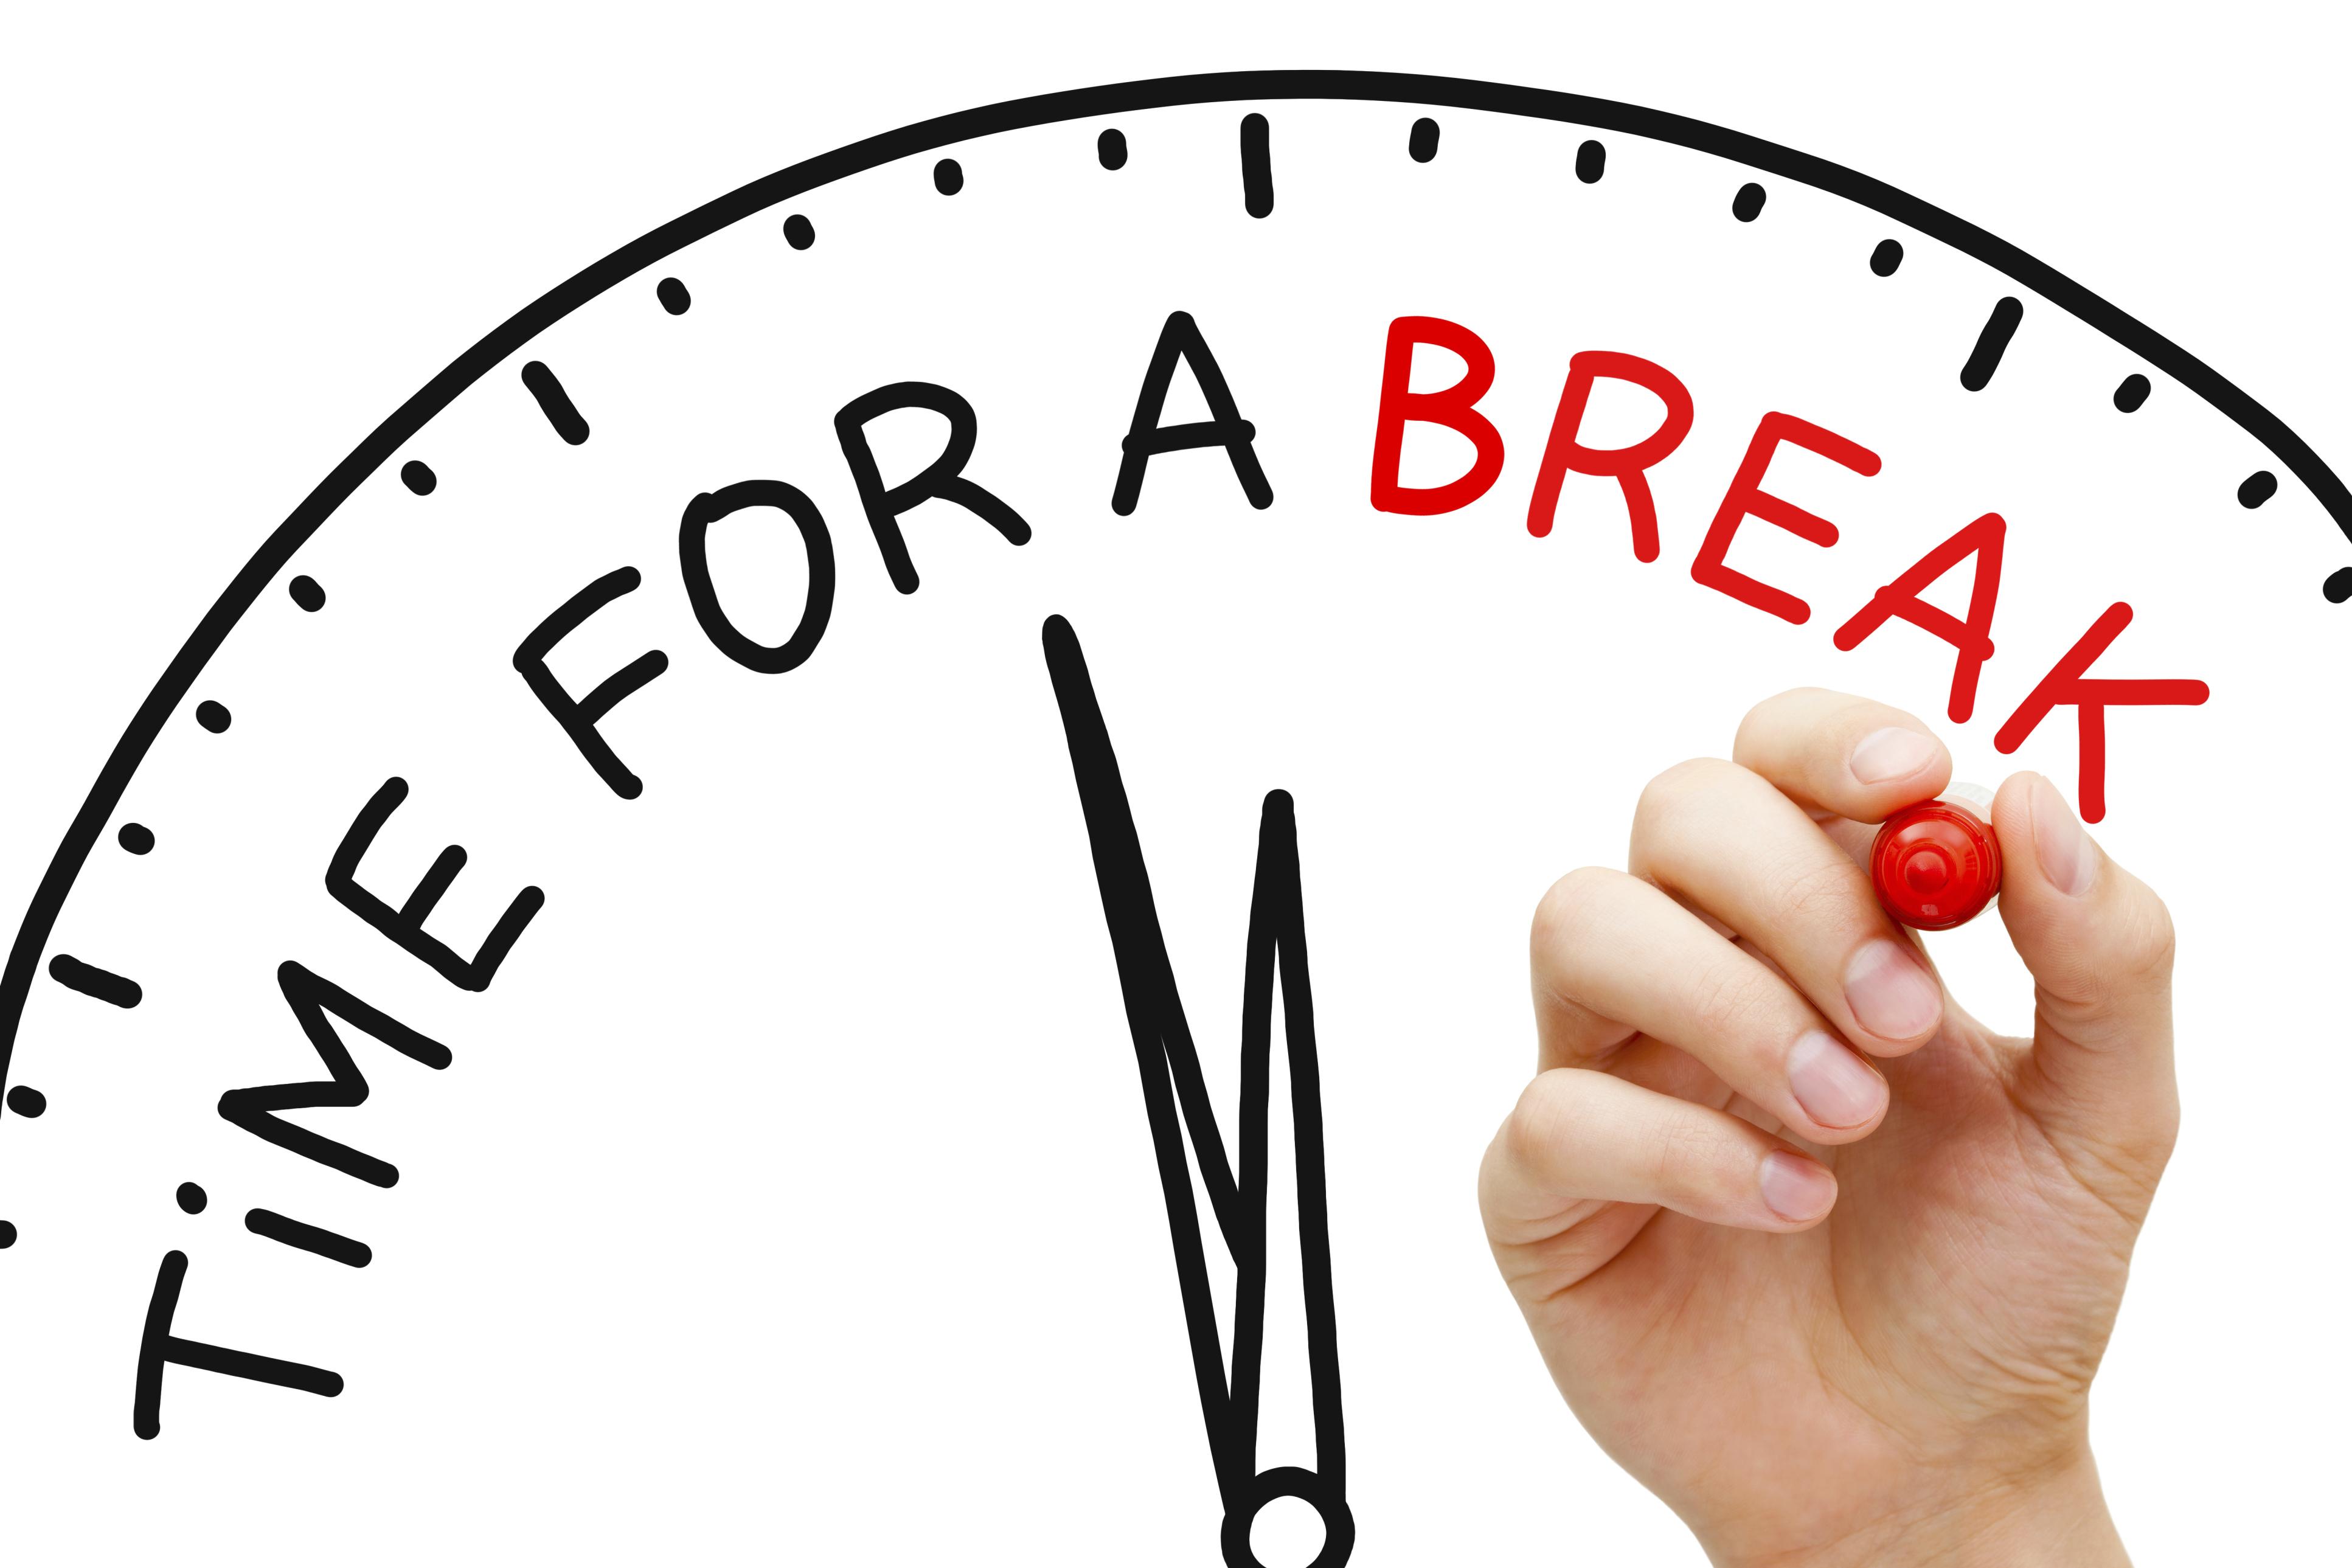 Break time free clipart 1